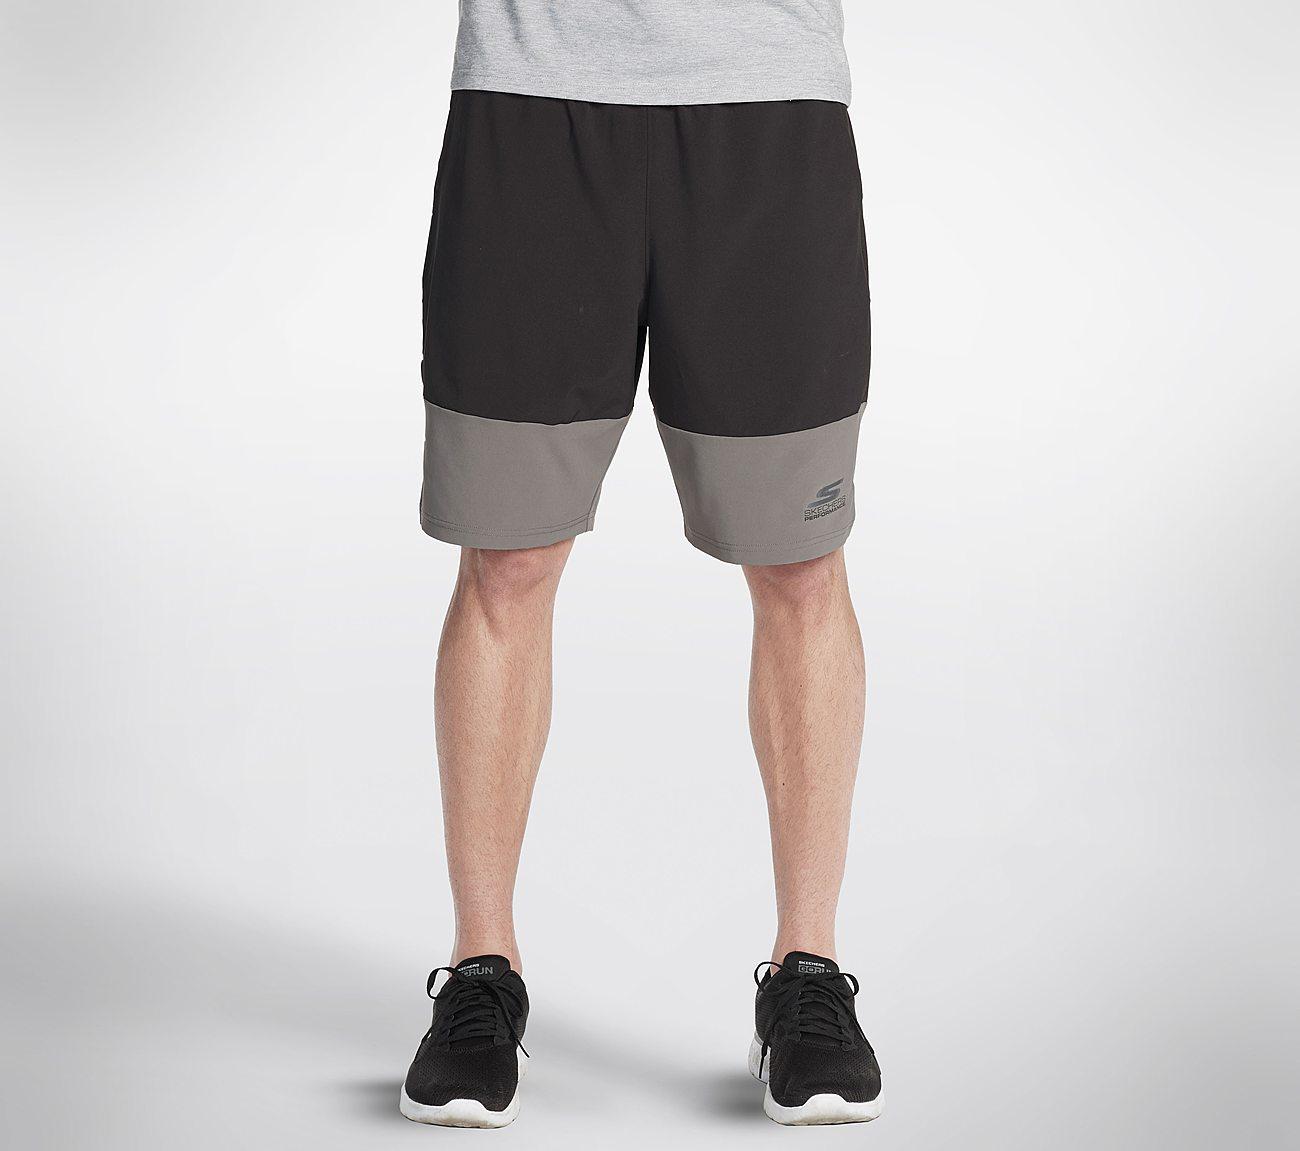 Runaway 2 in 1 Shorts